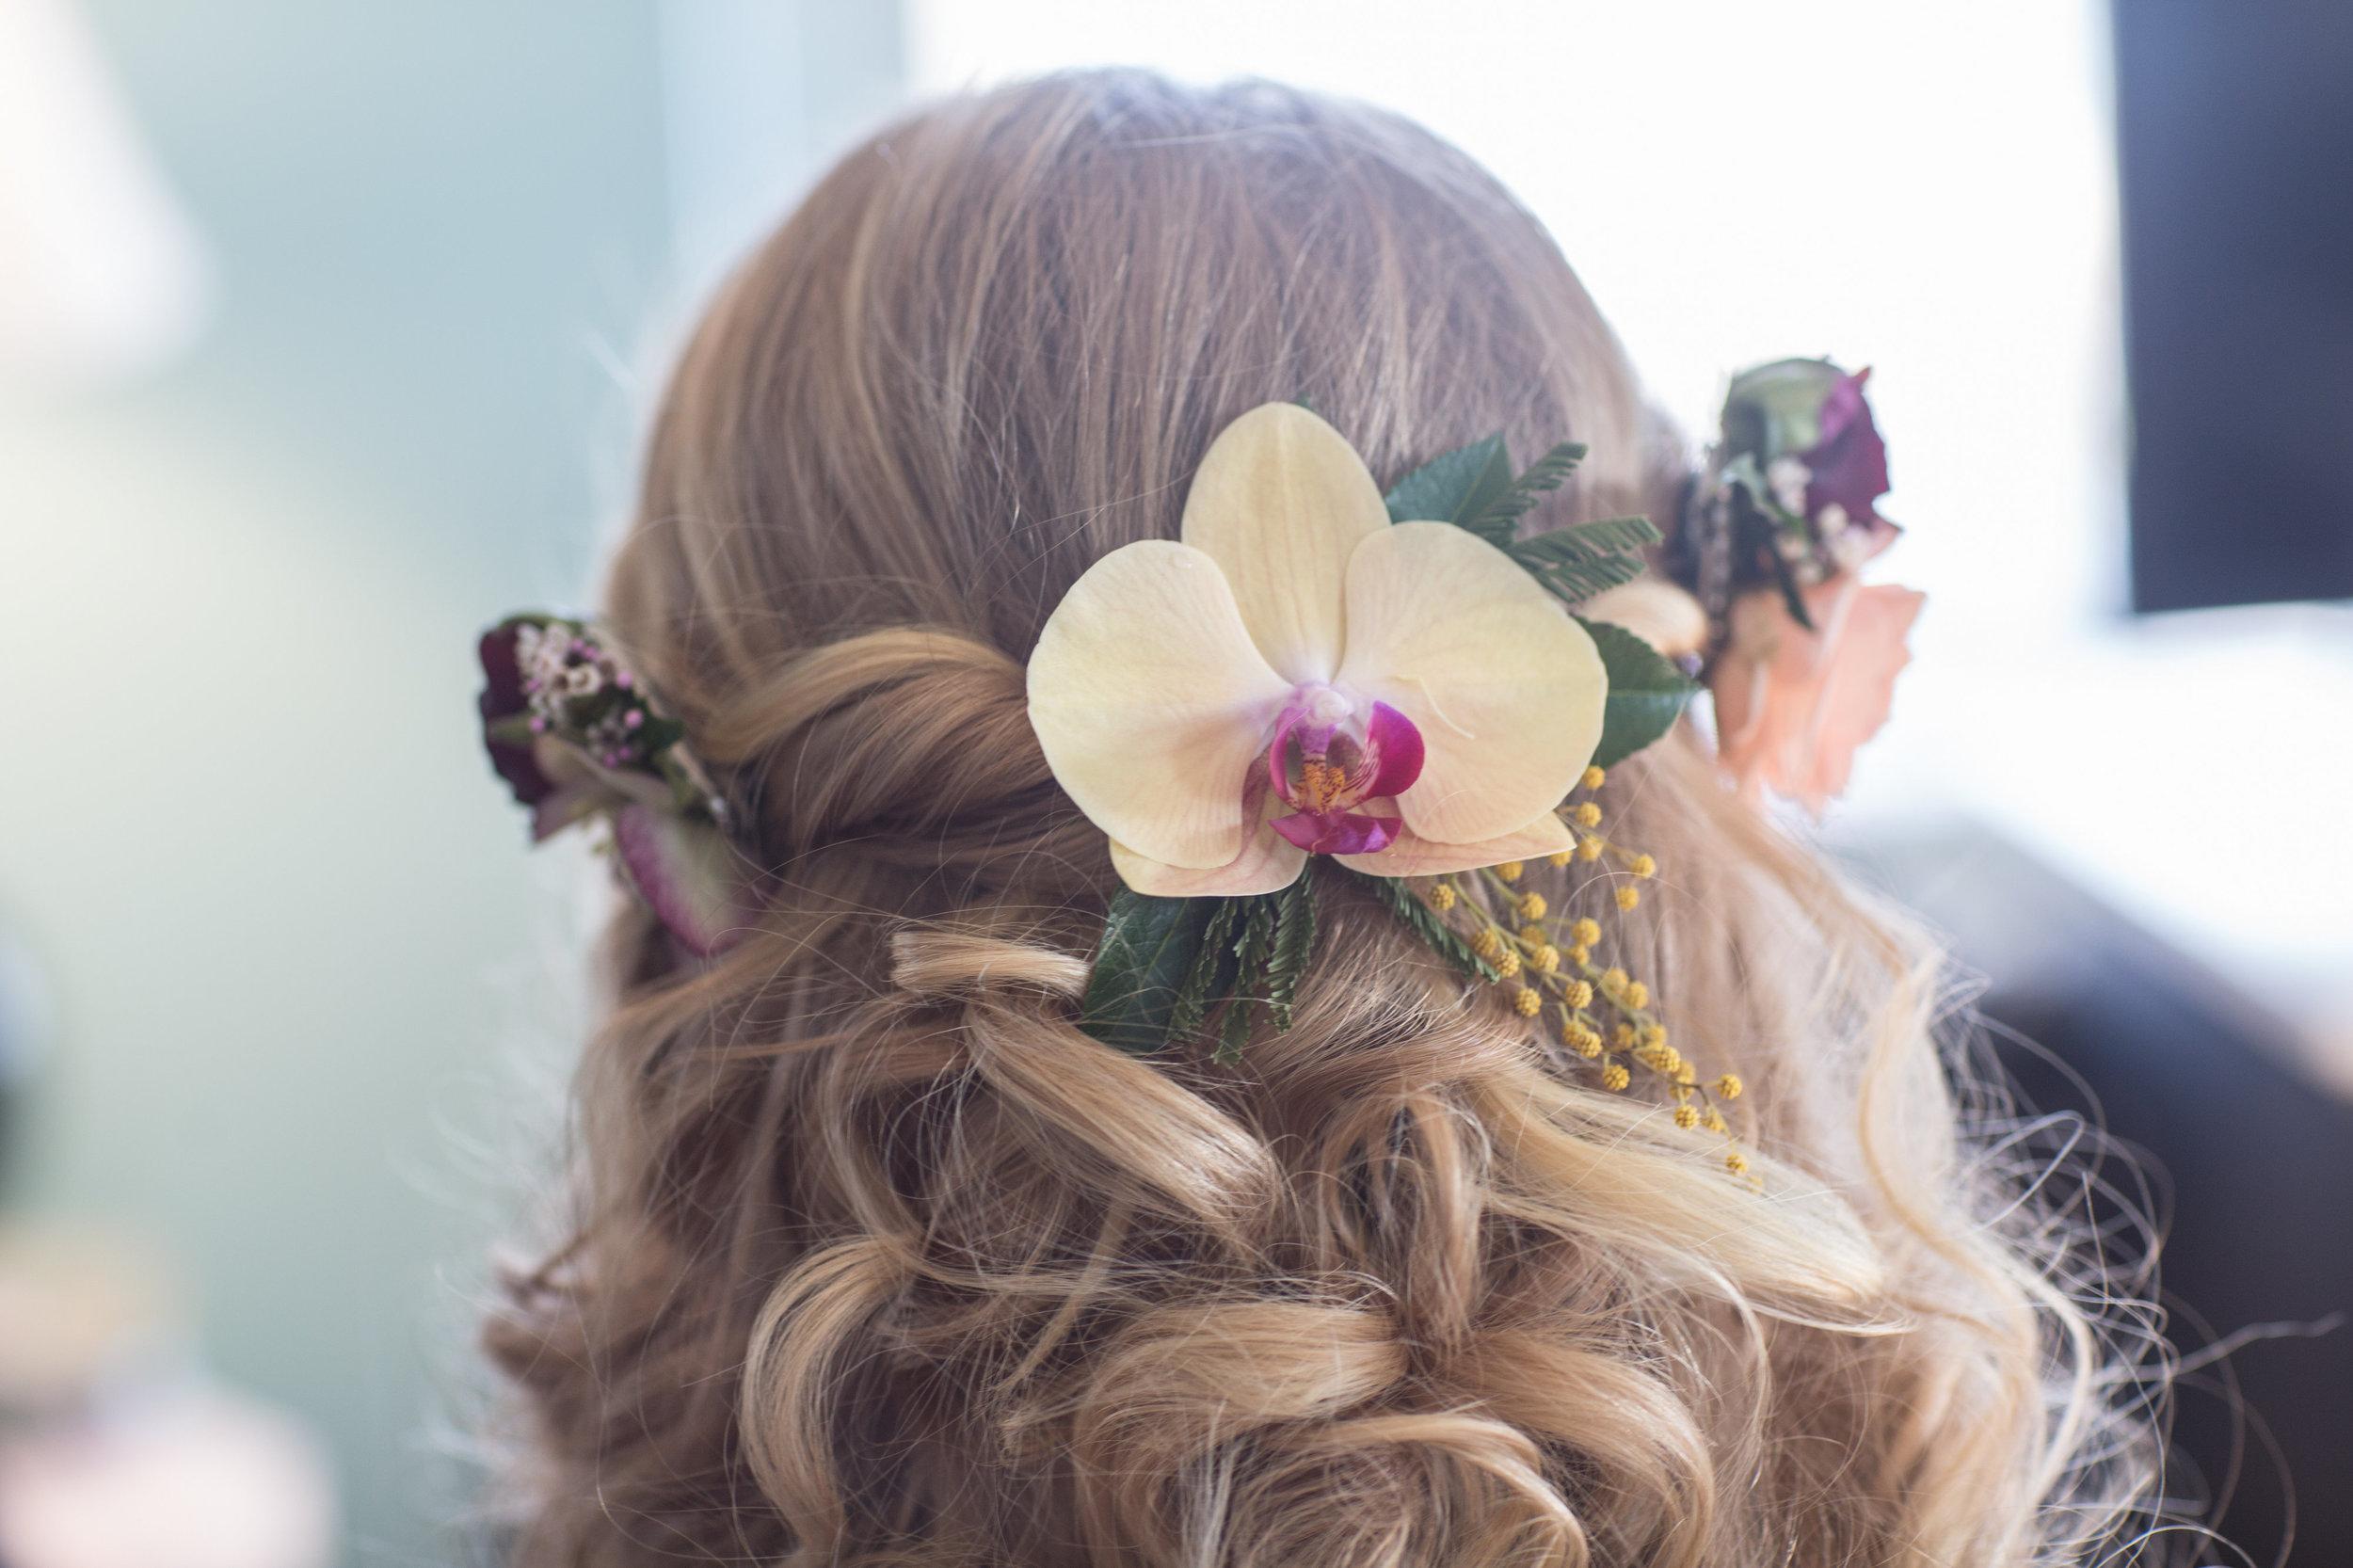 NJ Wedding, Orchid Hair Flowers, Bridal flowers, Fall Wedding, Hello Gorgeous Photography